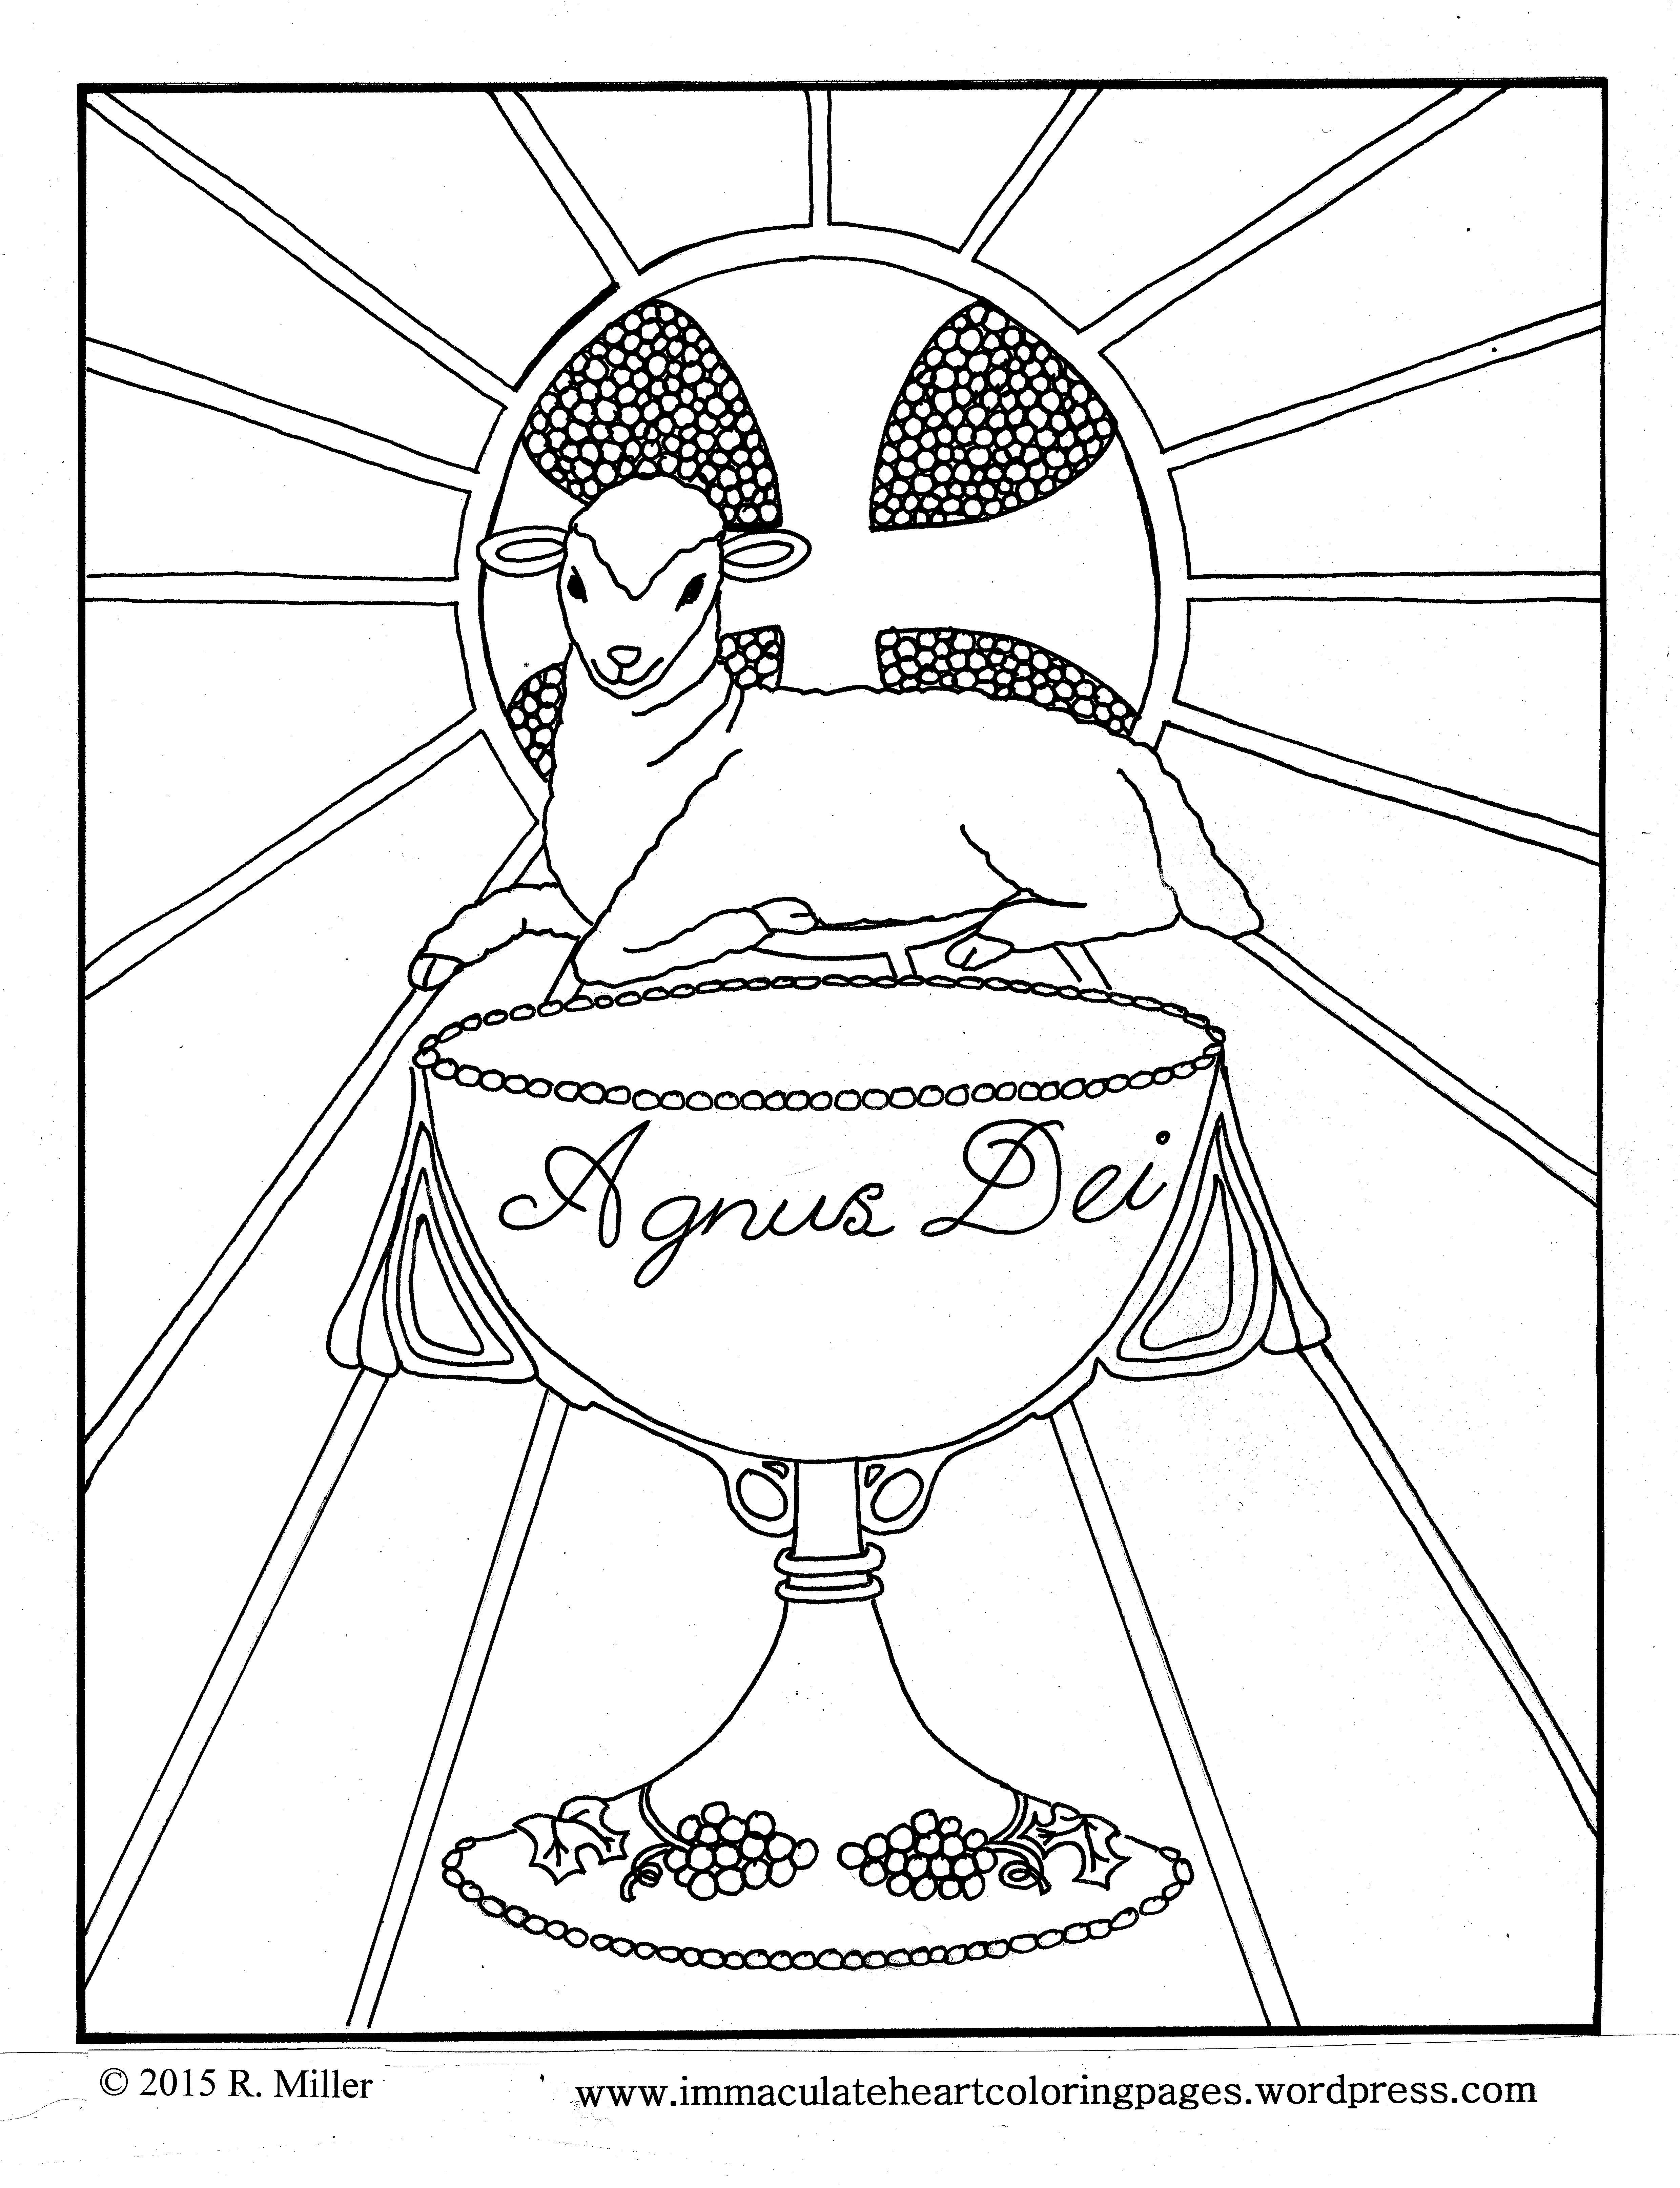 Agnus Dei / Lamb of God/ Eucharist coloring page